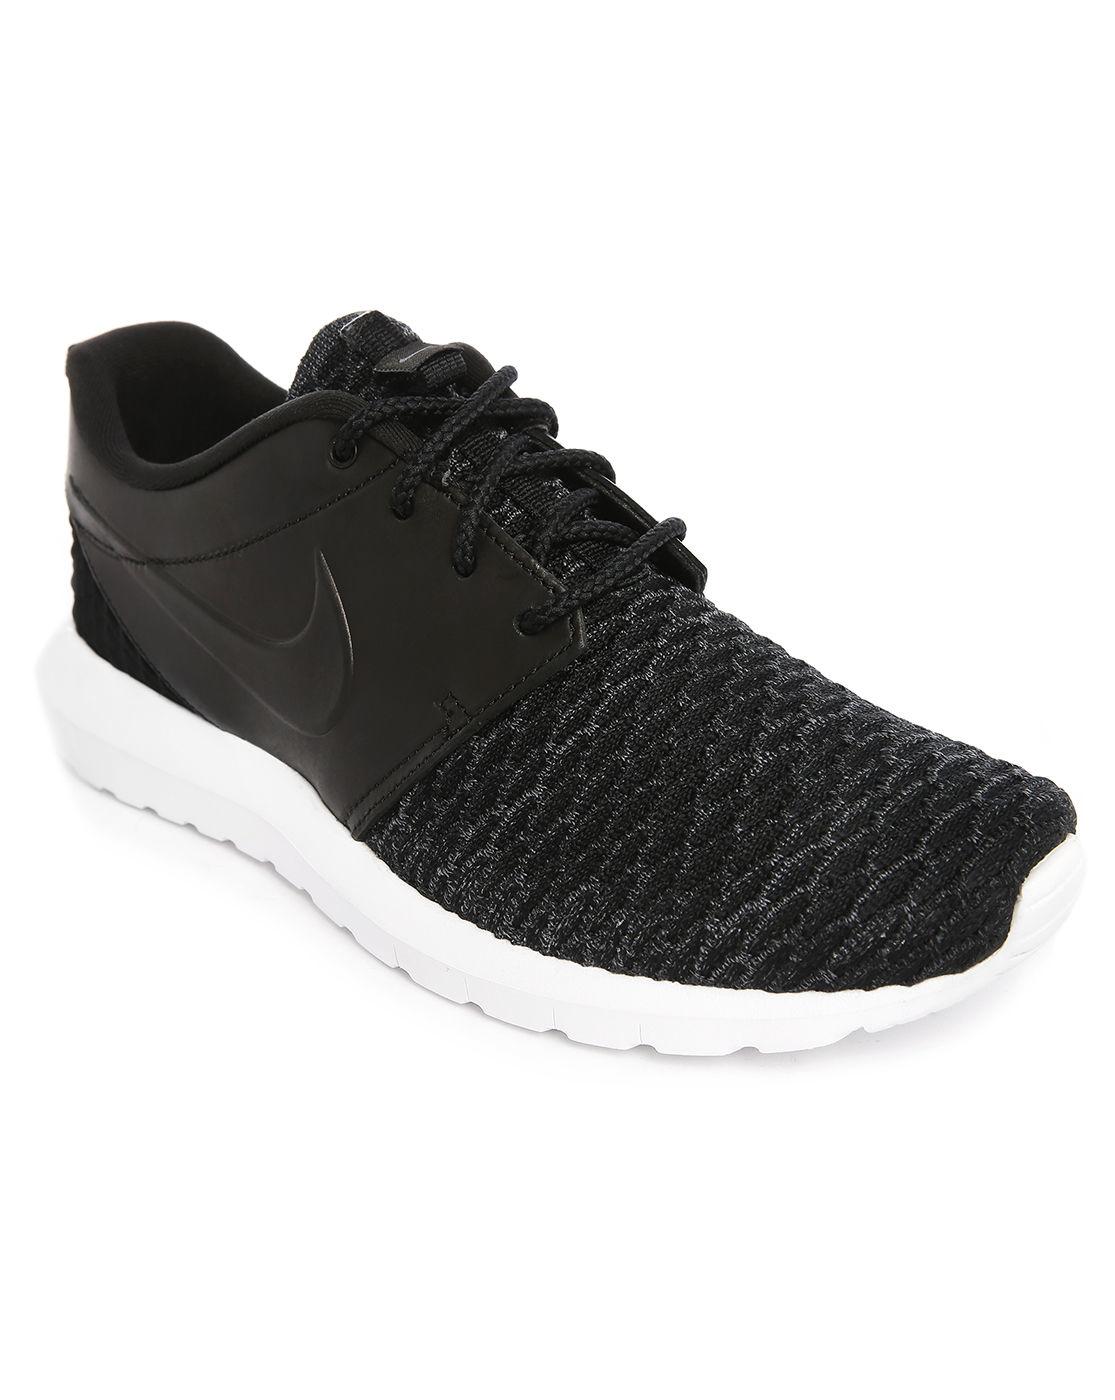 nike roshe run flyknit black sneakers in black for lyst